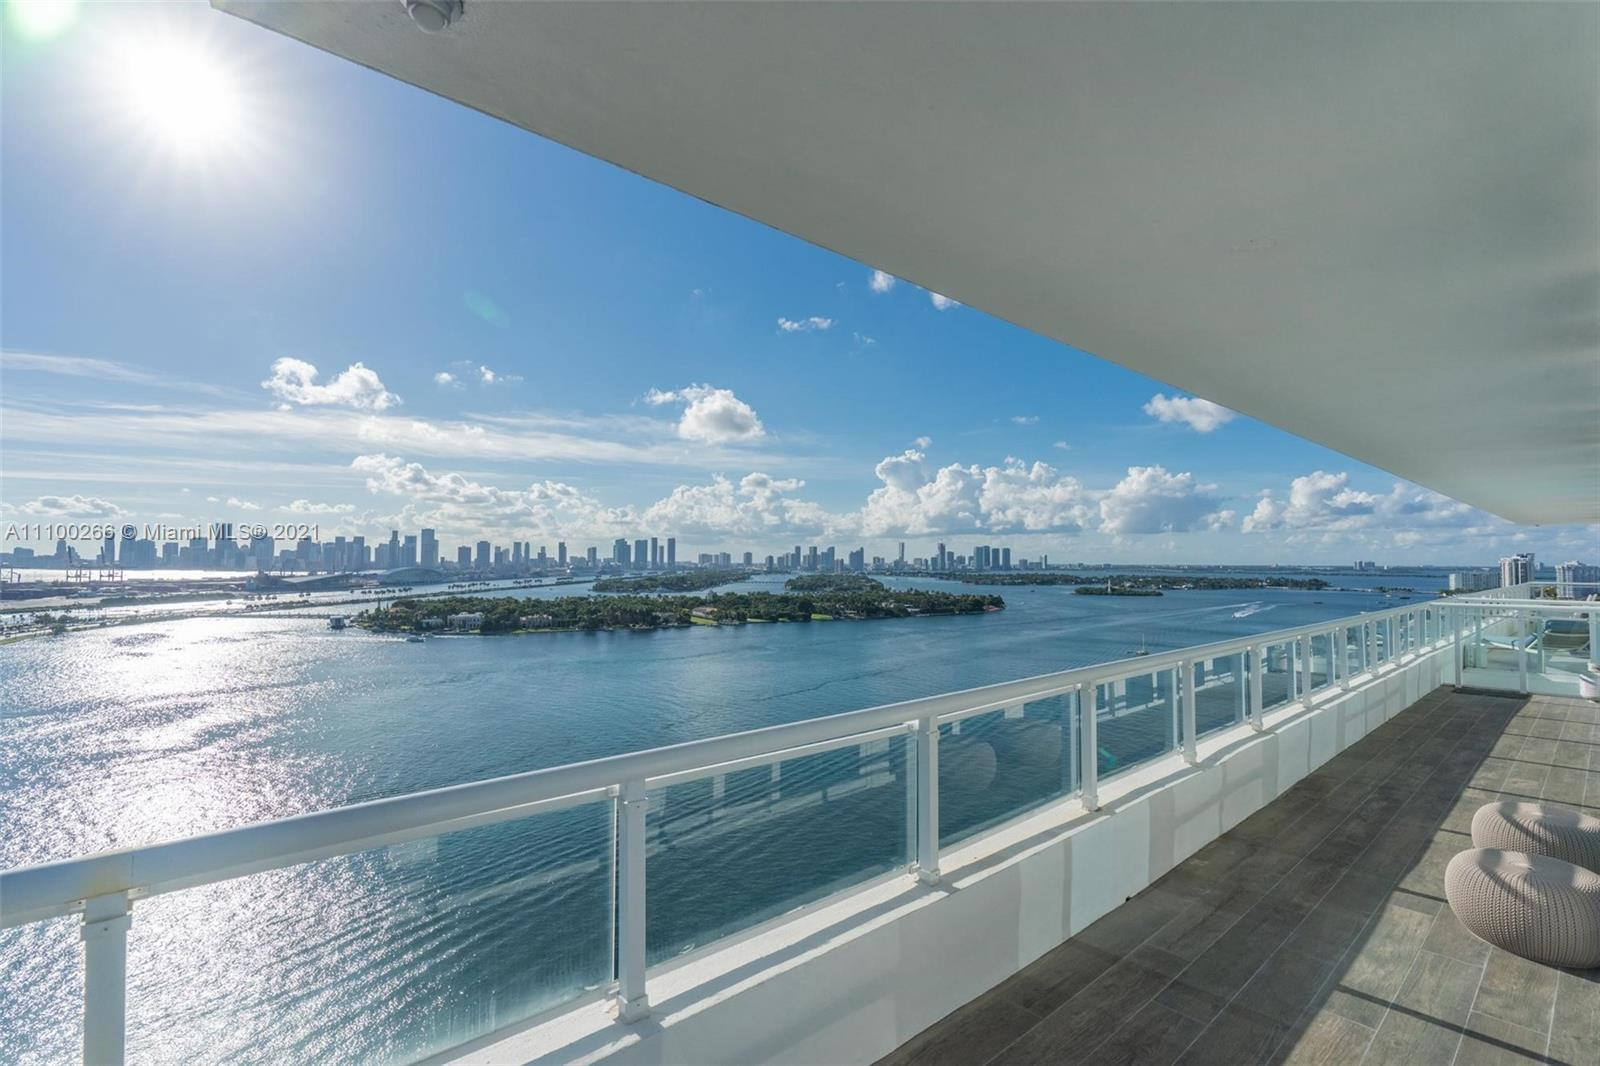 Enjoy this Spectacular 3 bedroom/ 3 full bath/ half bath open floor plan unit. Views consist of 180-